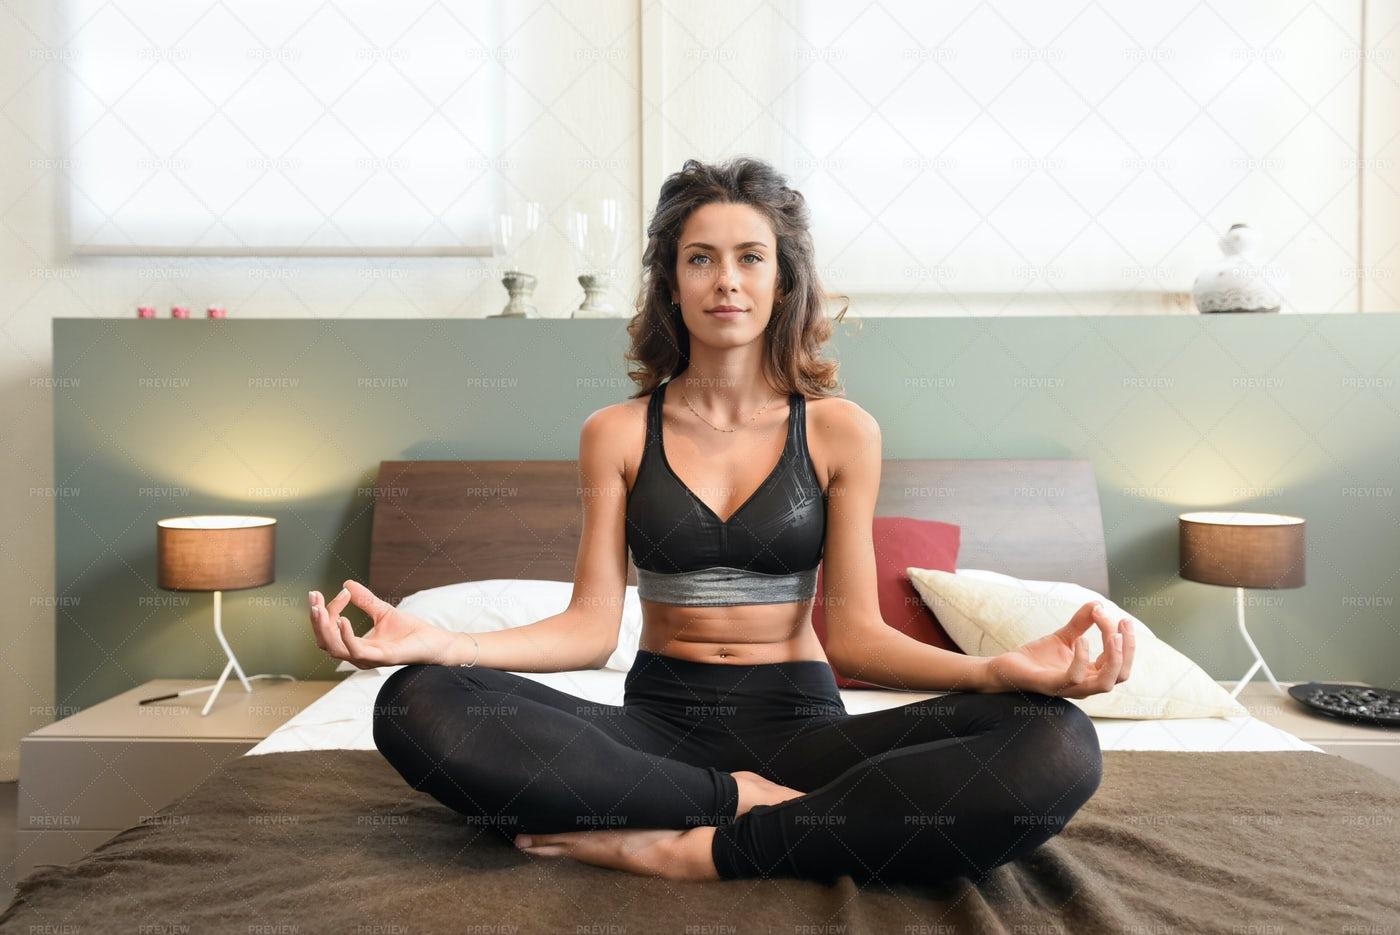 Fit Healthy Woman Meditating: Stock Photos